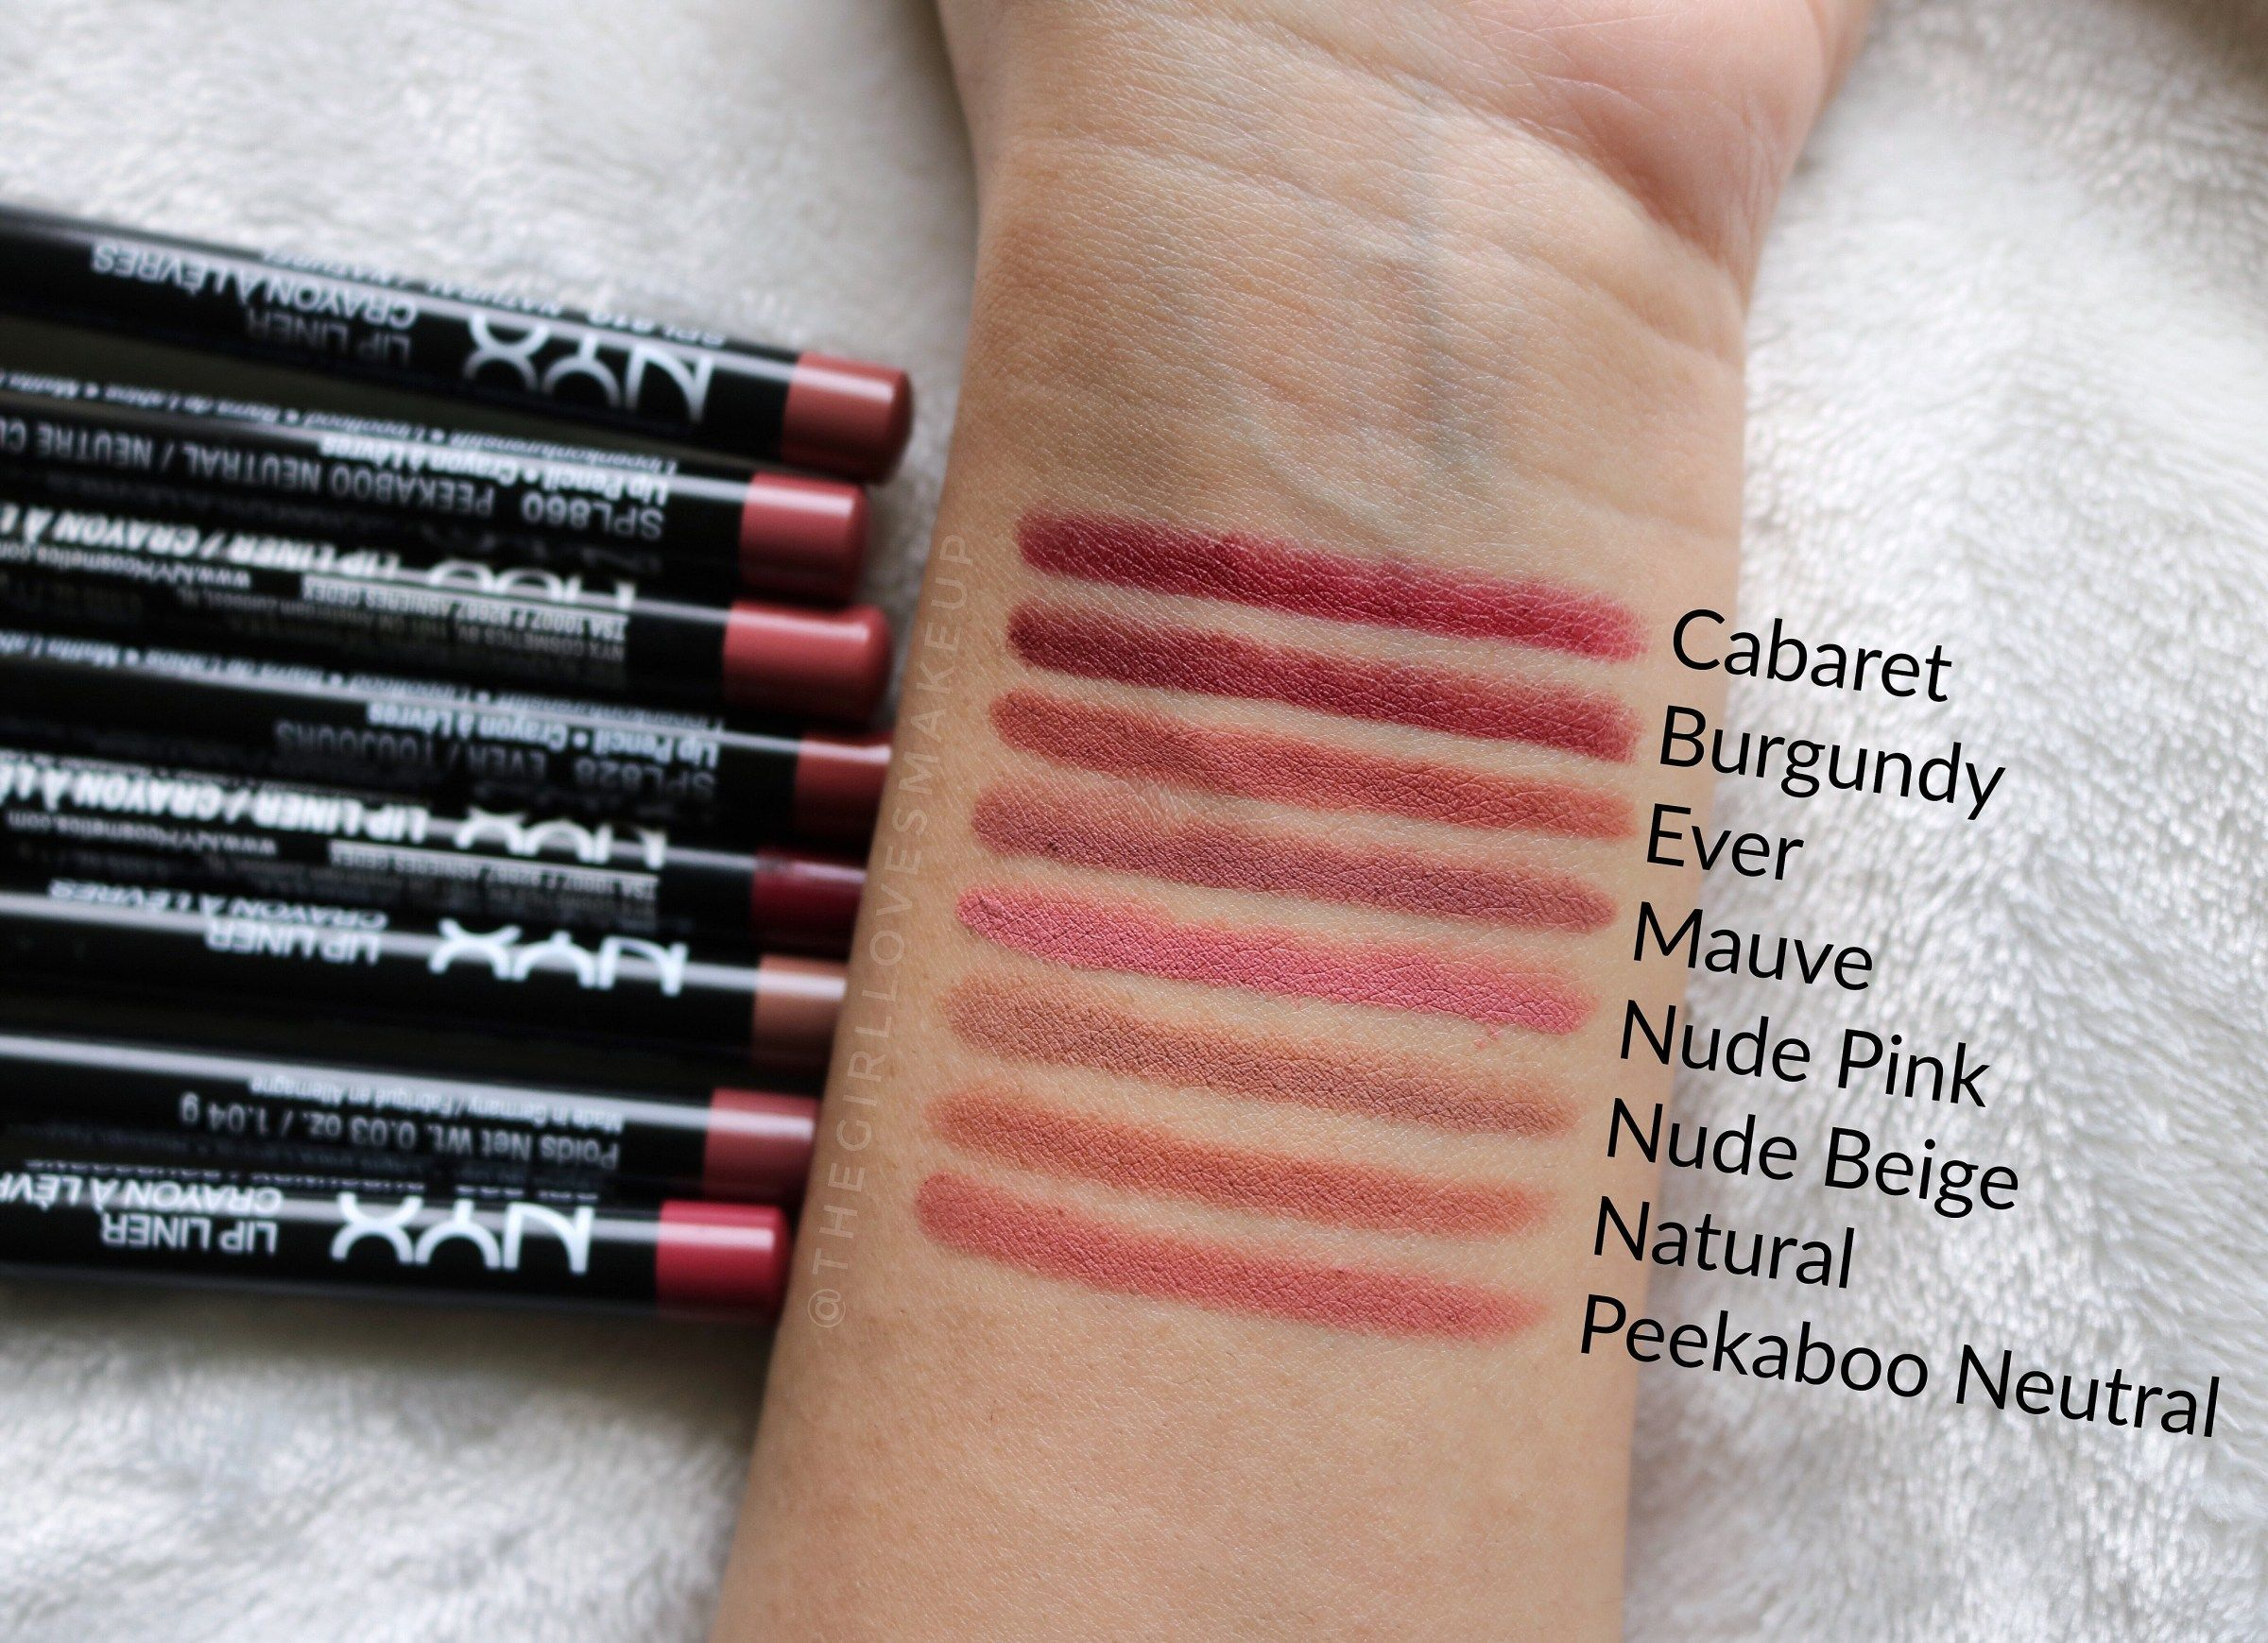 NYX Professional Makeup Slim Lip Pencils Review and